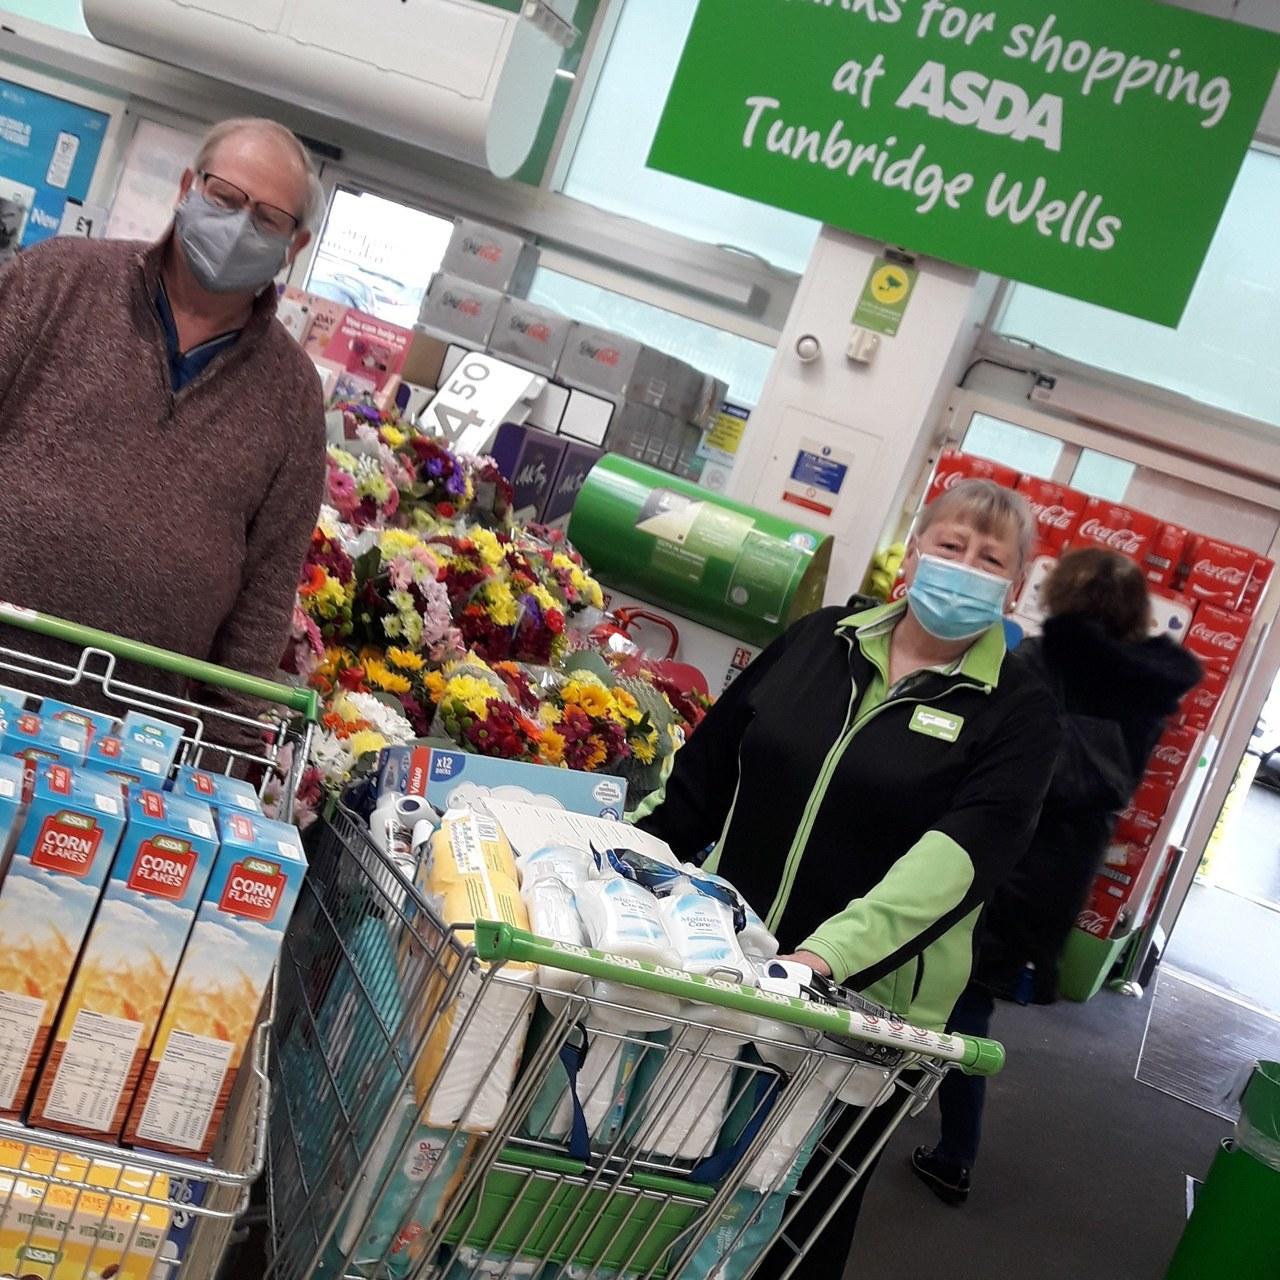 Helping the community | Asda Tunbridge Wells